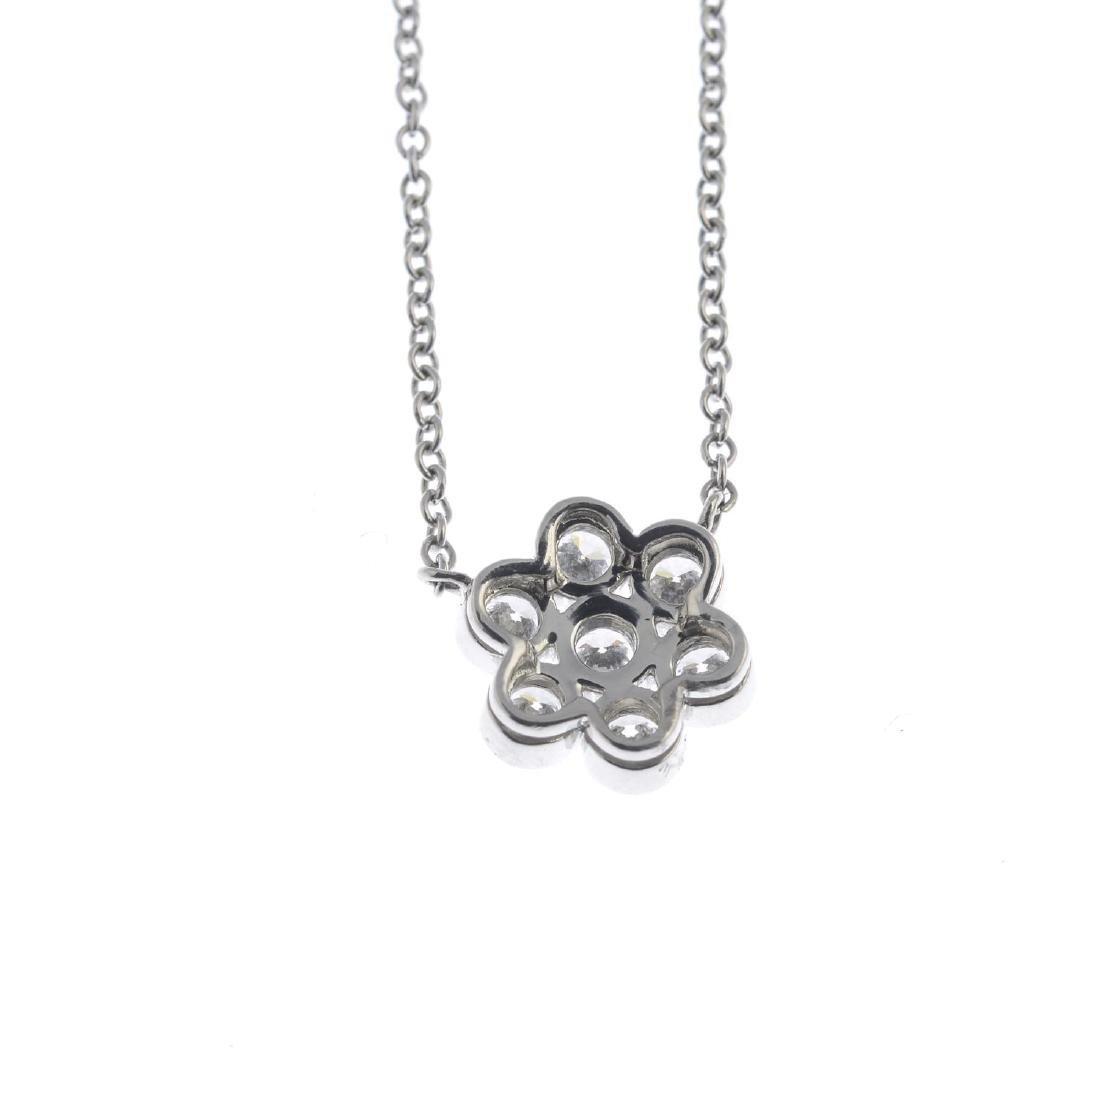 TIFFANY & CO. - a diamond 'Enchant' cluster necklace. - 2